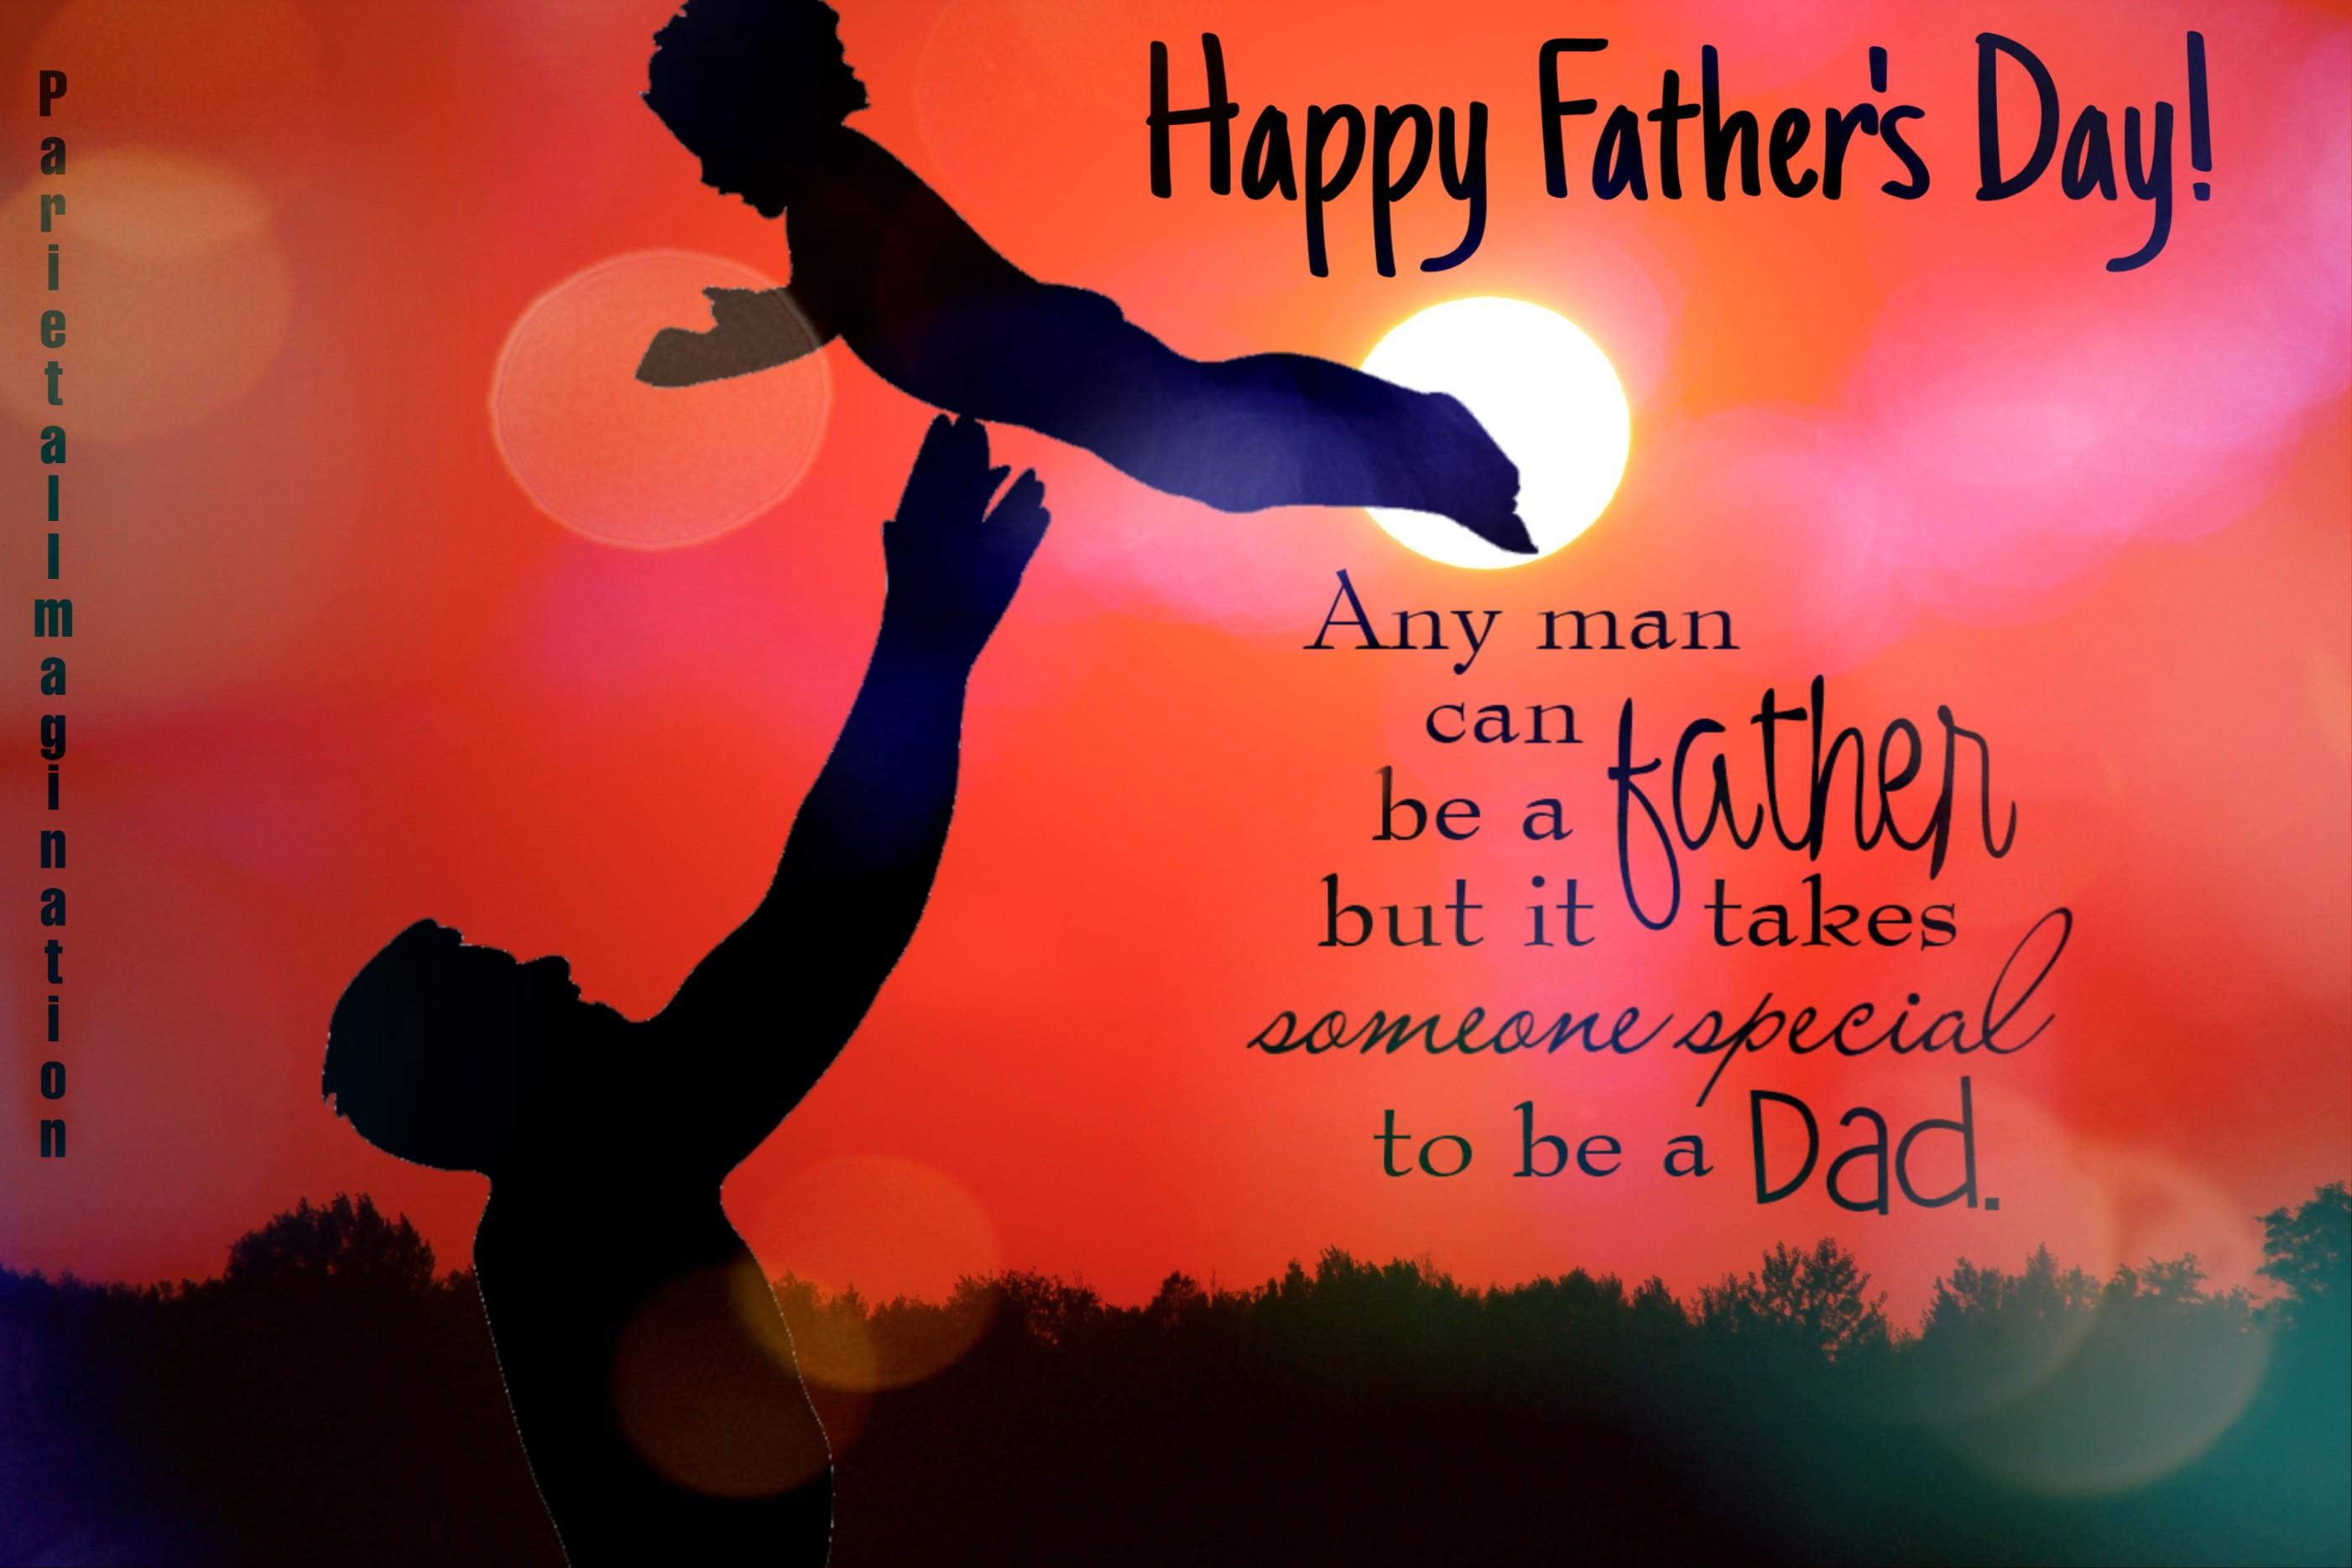 #happyfathersday #freetoedit